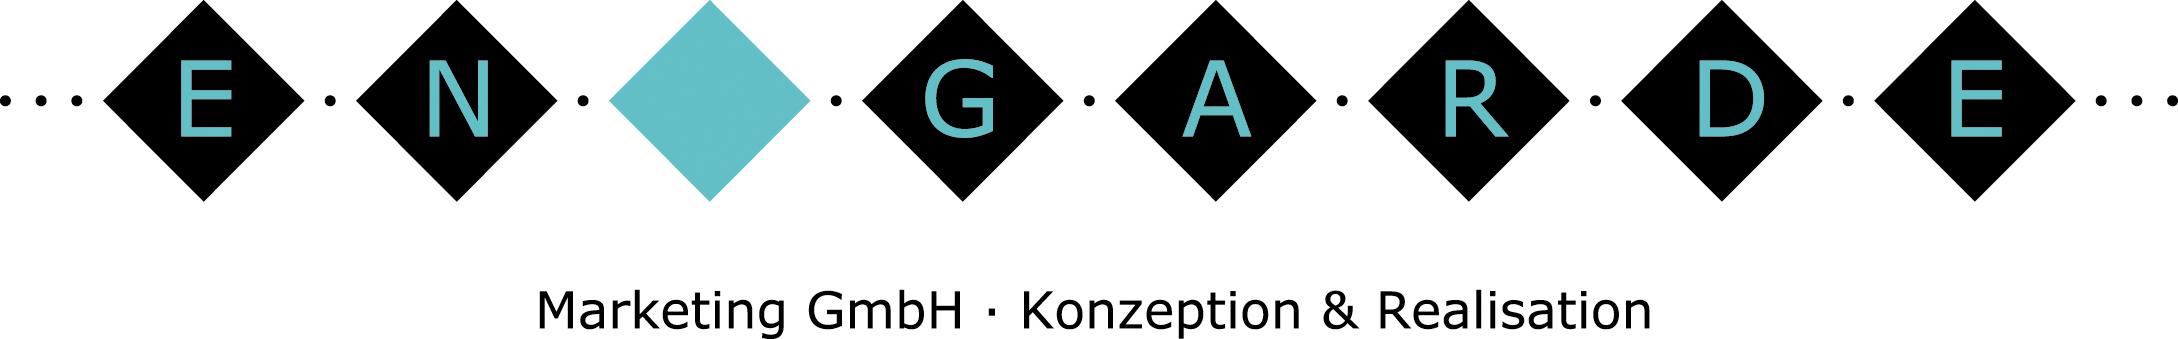 EN GARDE Marketing GmbH